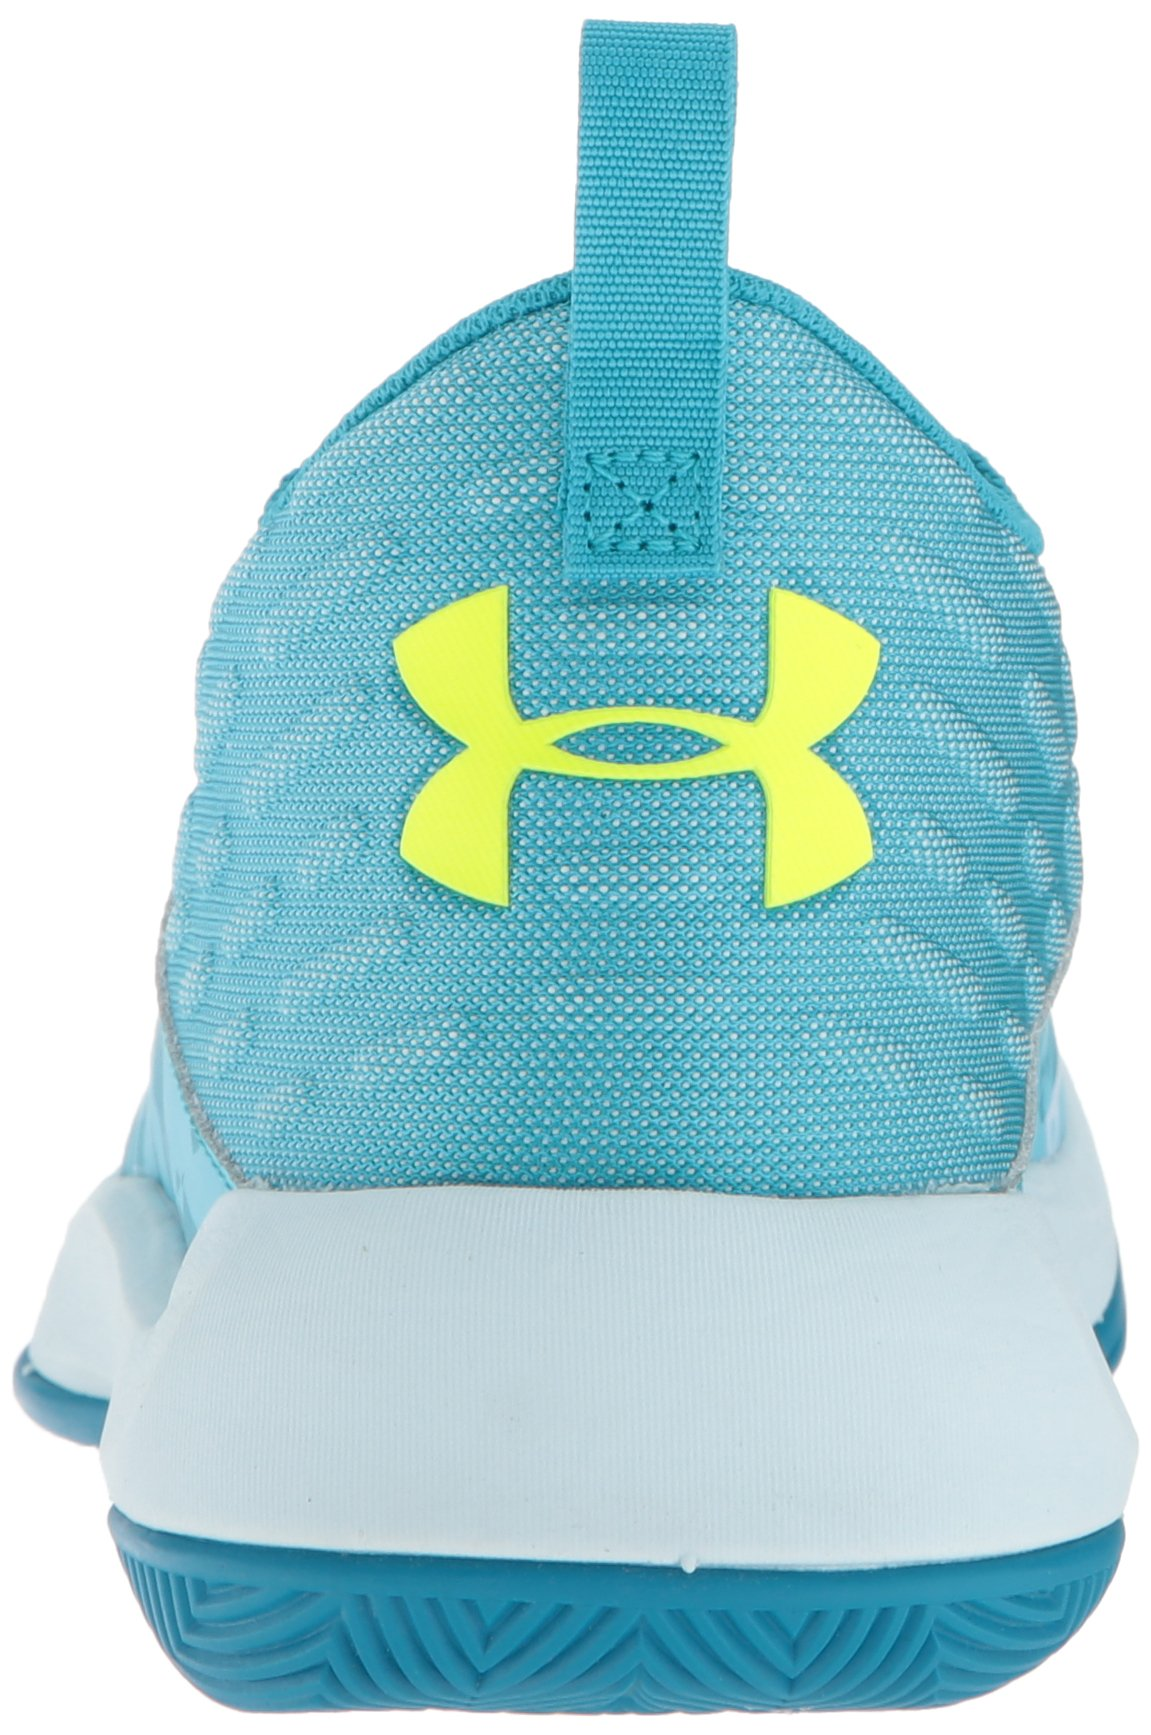 Under Armour Girls' Grade School Lightning 5 Basketball Shoe, Deceit (300)/Halogen Blue, 5.5 by Under Armour (Image #2)